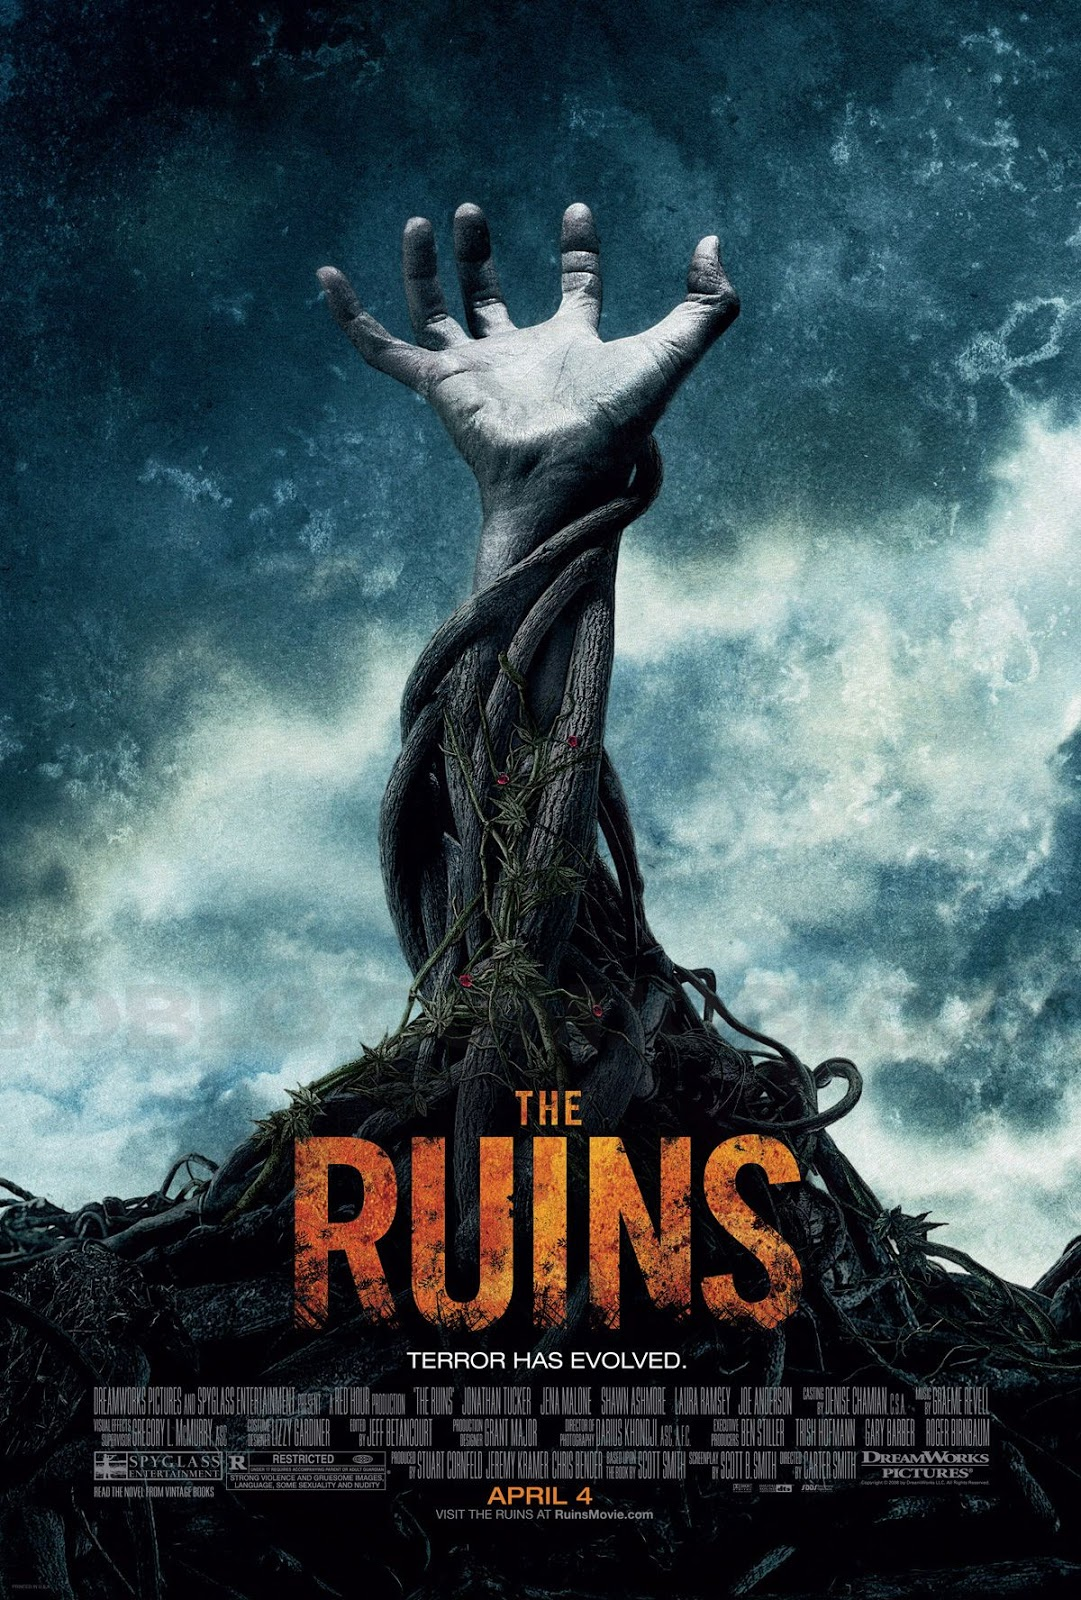 The Ruins 2008 Dual Audio Hindi English 720p BluRay Full Movie Free Download